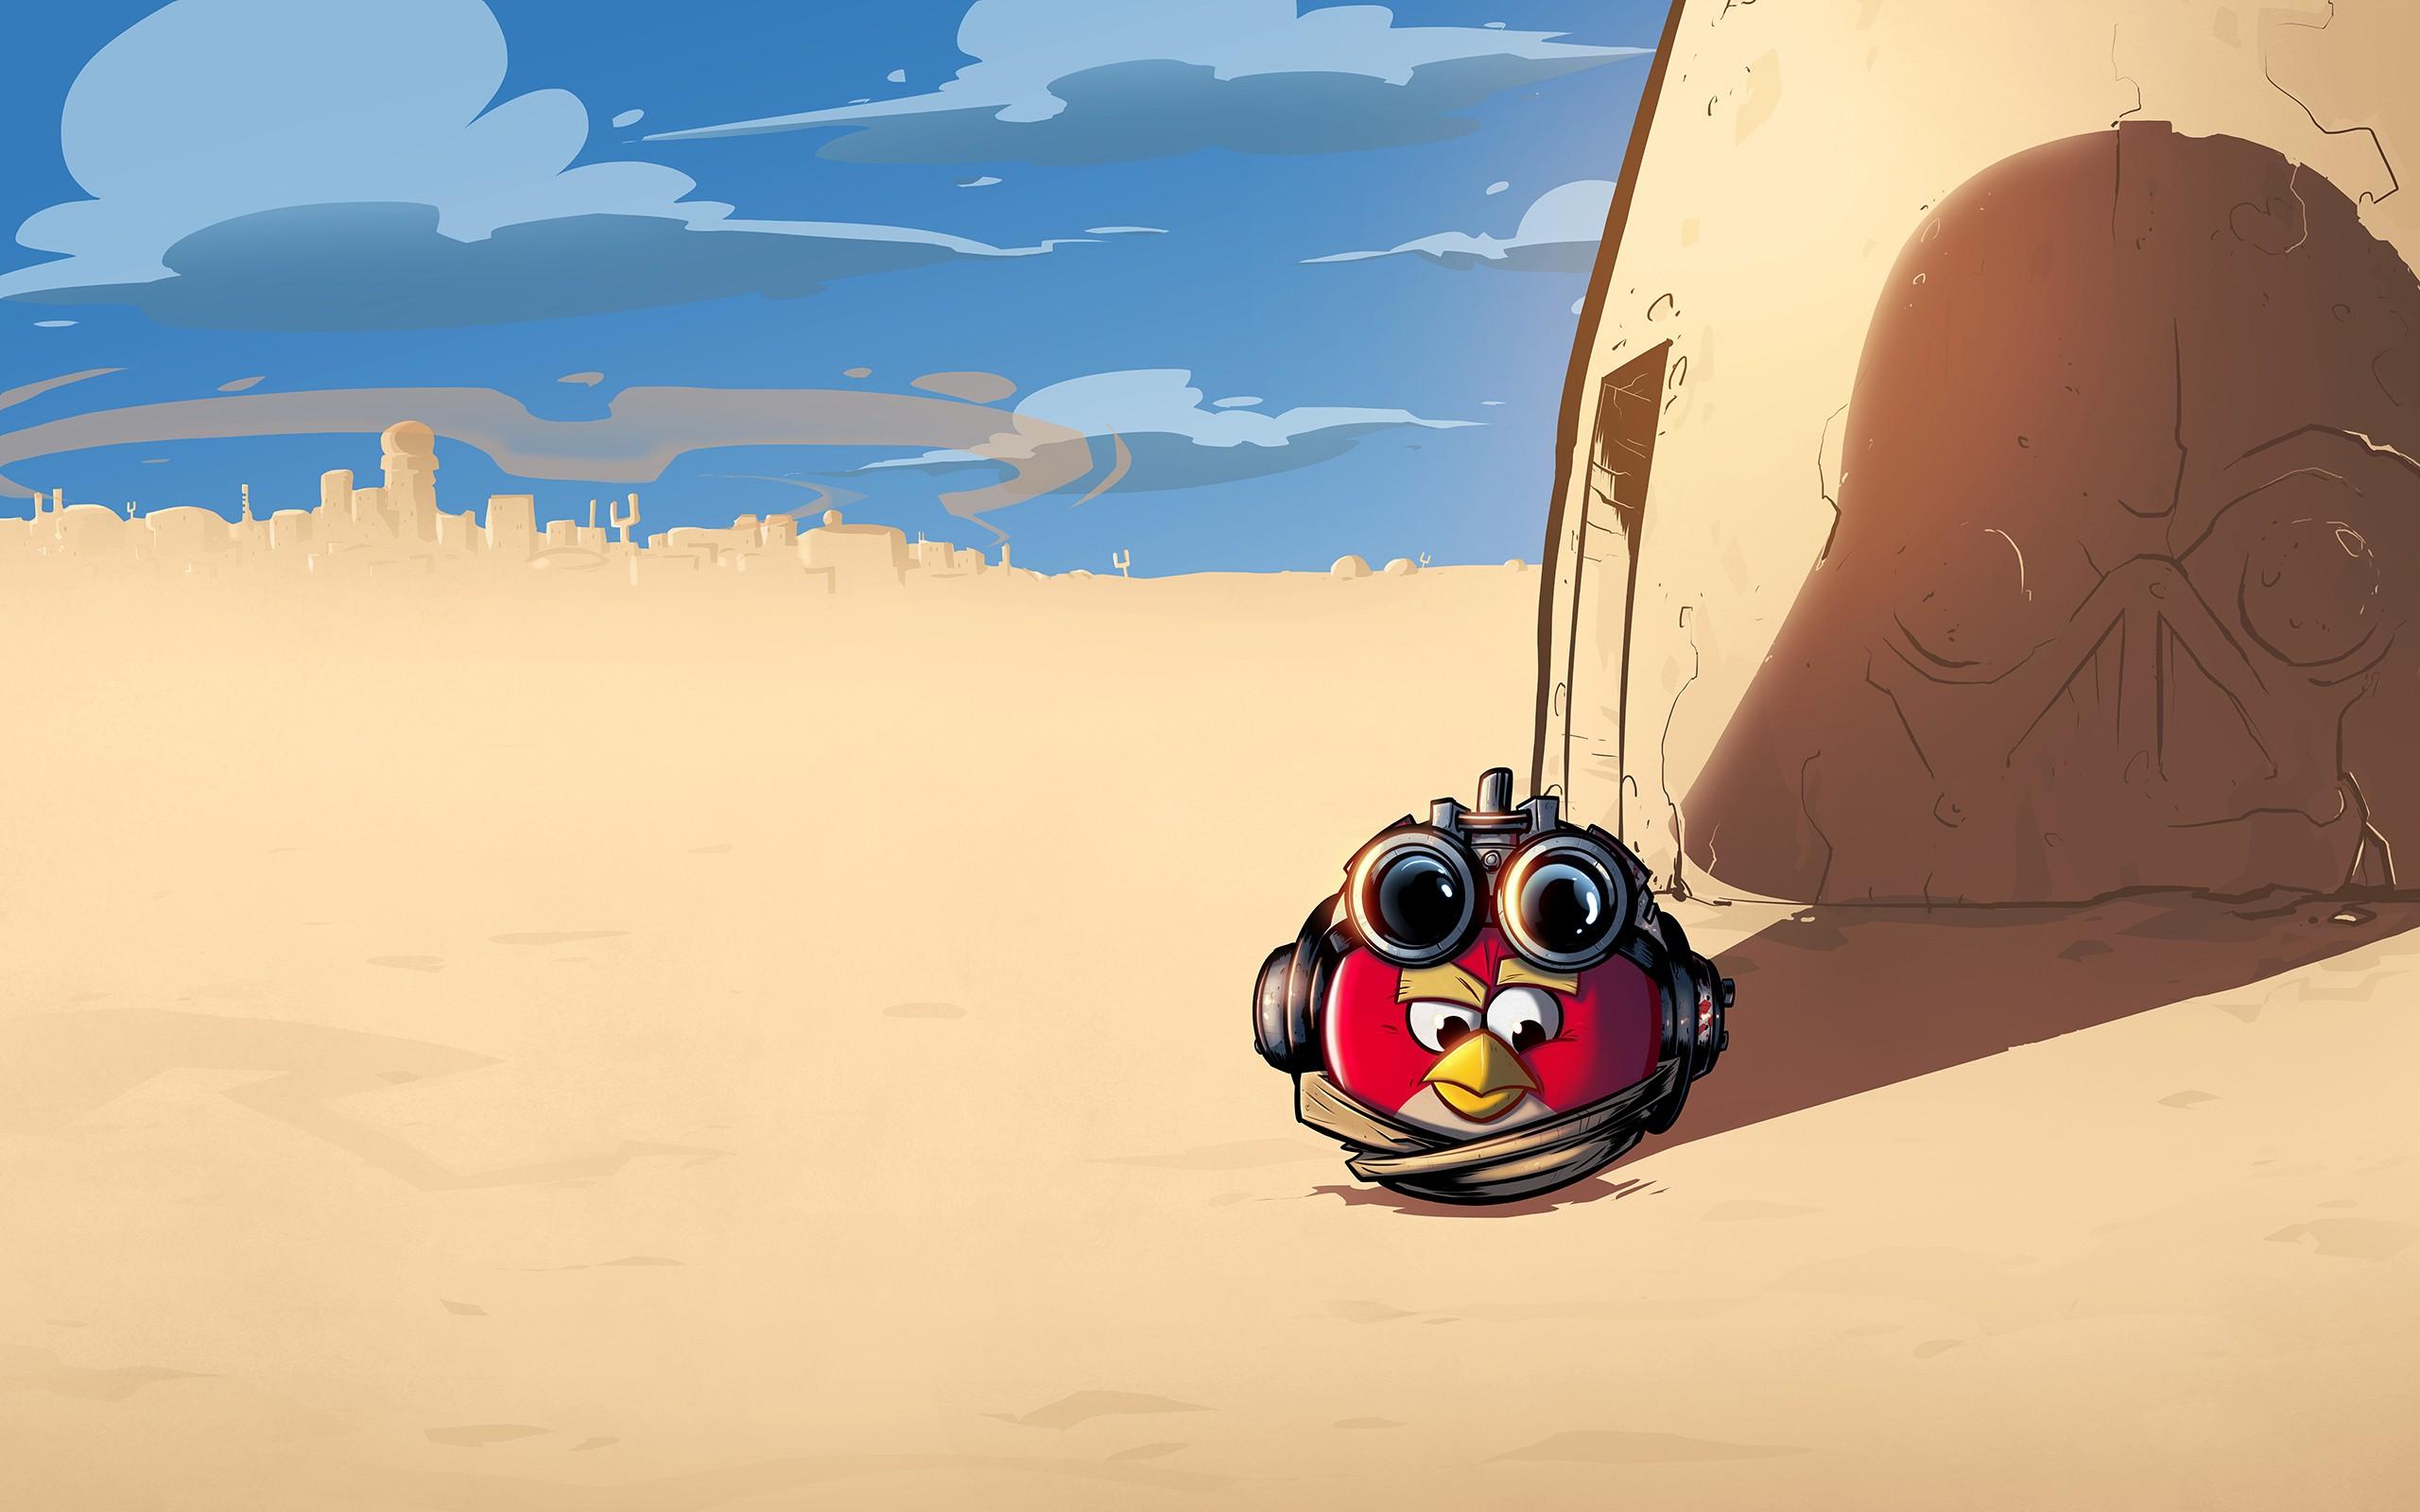 Wallpaper Illustration Star Wars Sand Vehicle Cartoon Desert Toy Angry Birds Anakin Skywalker Tatooine Screenshot Natural Environment Atmosphere Of Earth Extreme Sport Aeolian Landform 2560x1600 Ristril 90198 Hd Wallpapers Wallhere